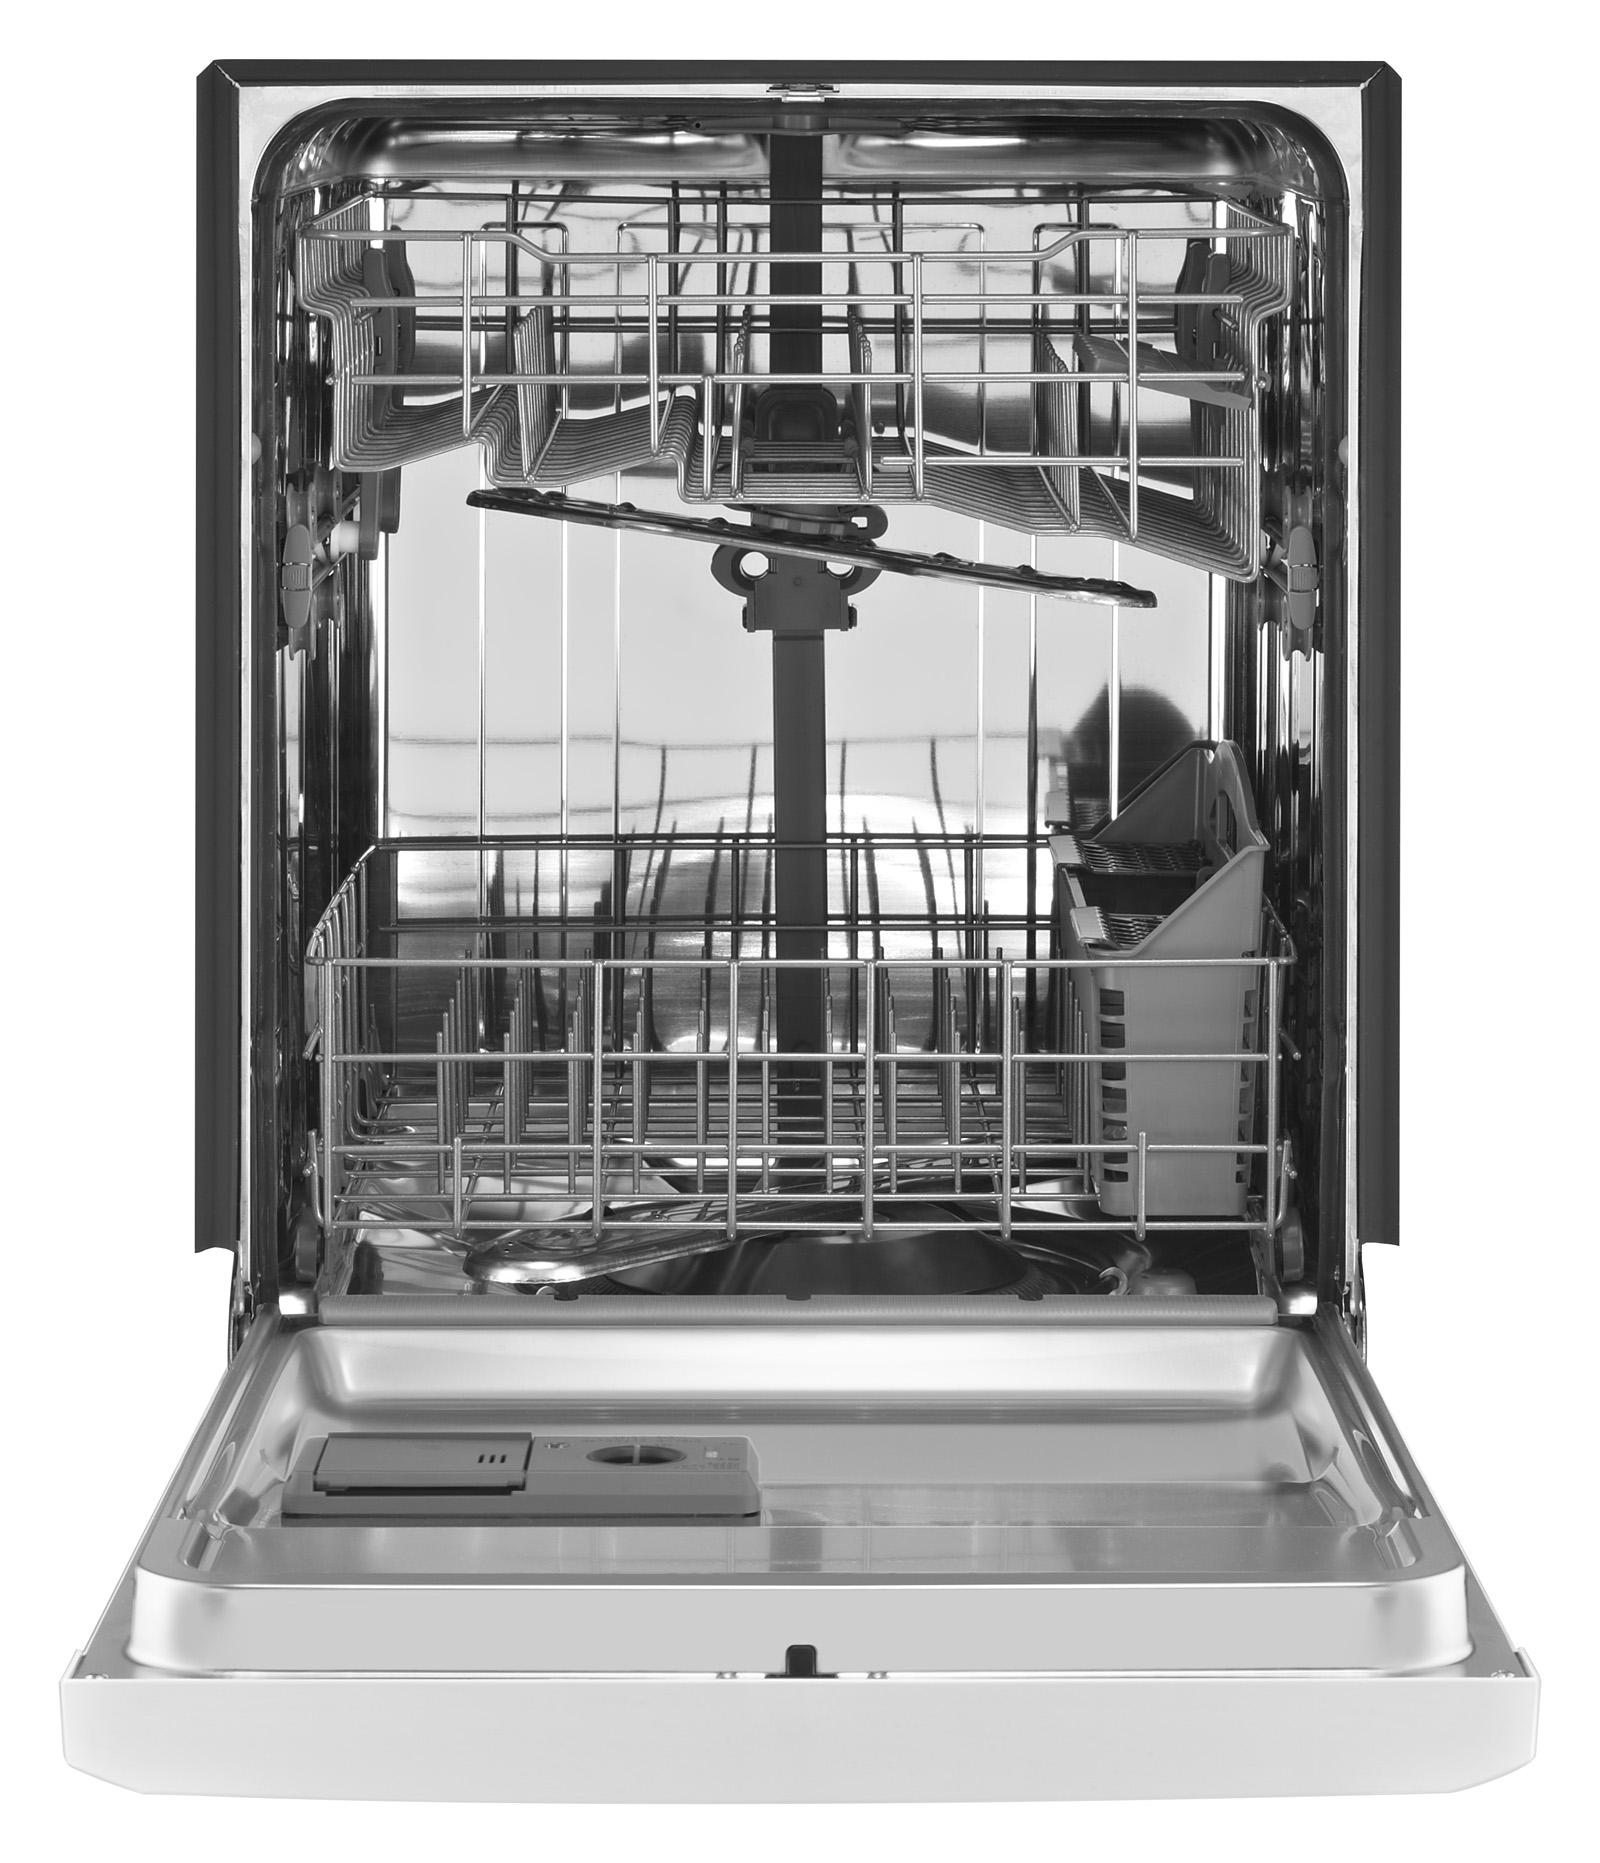 "Maytag 24"" Built-In Dishwasher w/ PowerBlast™ Cycle - White"